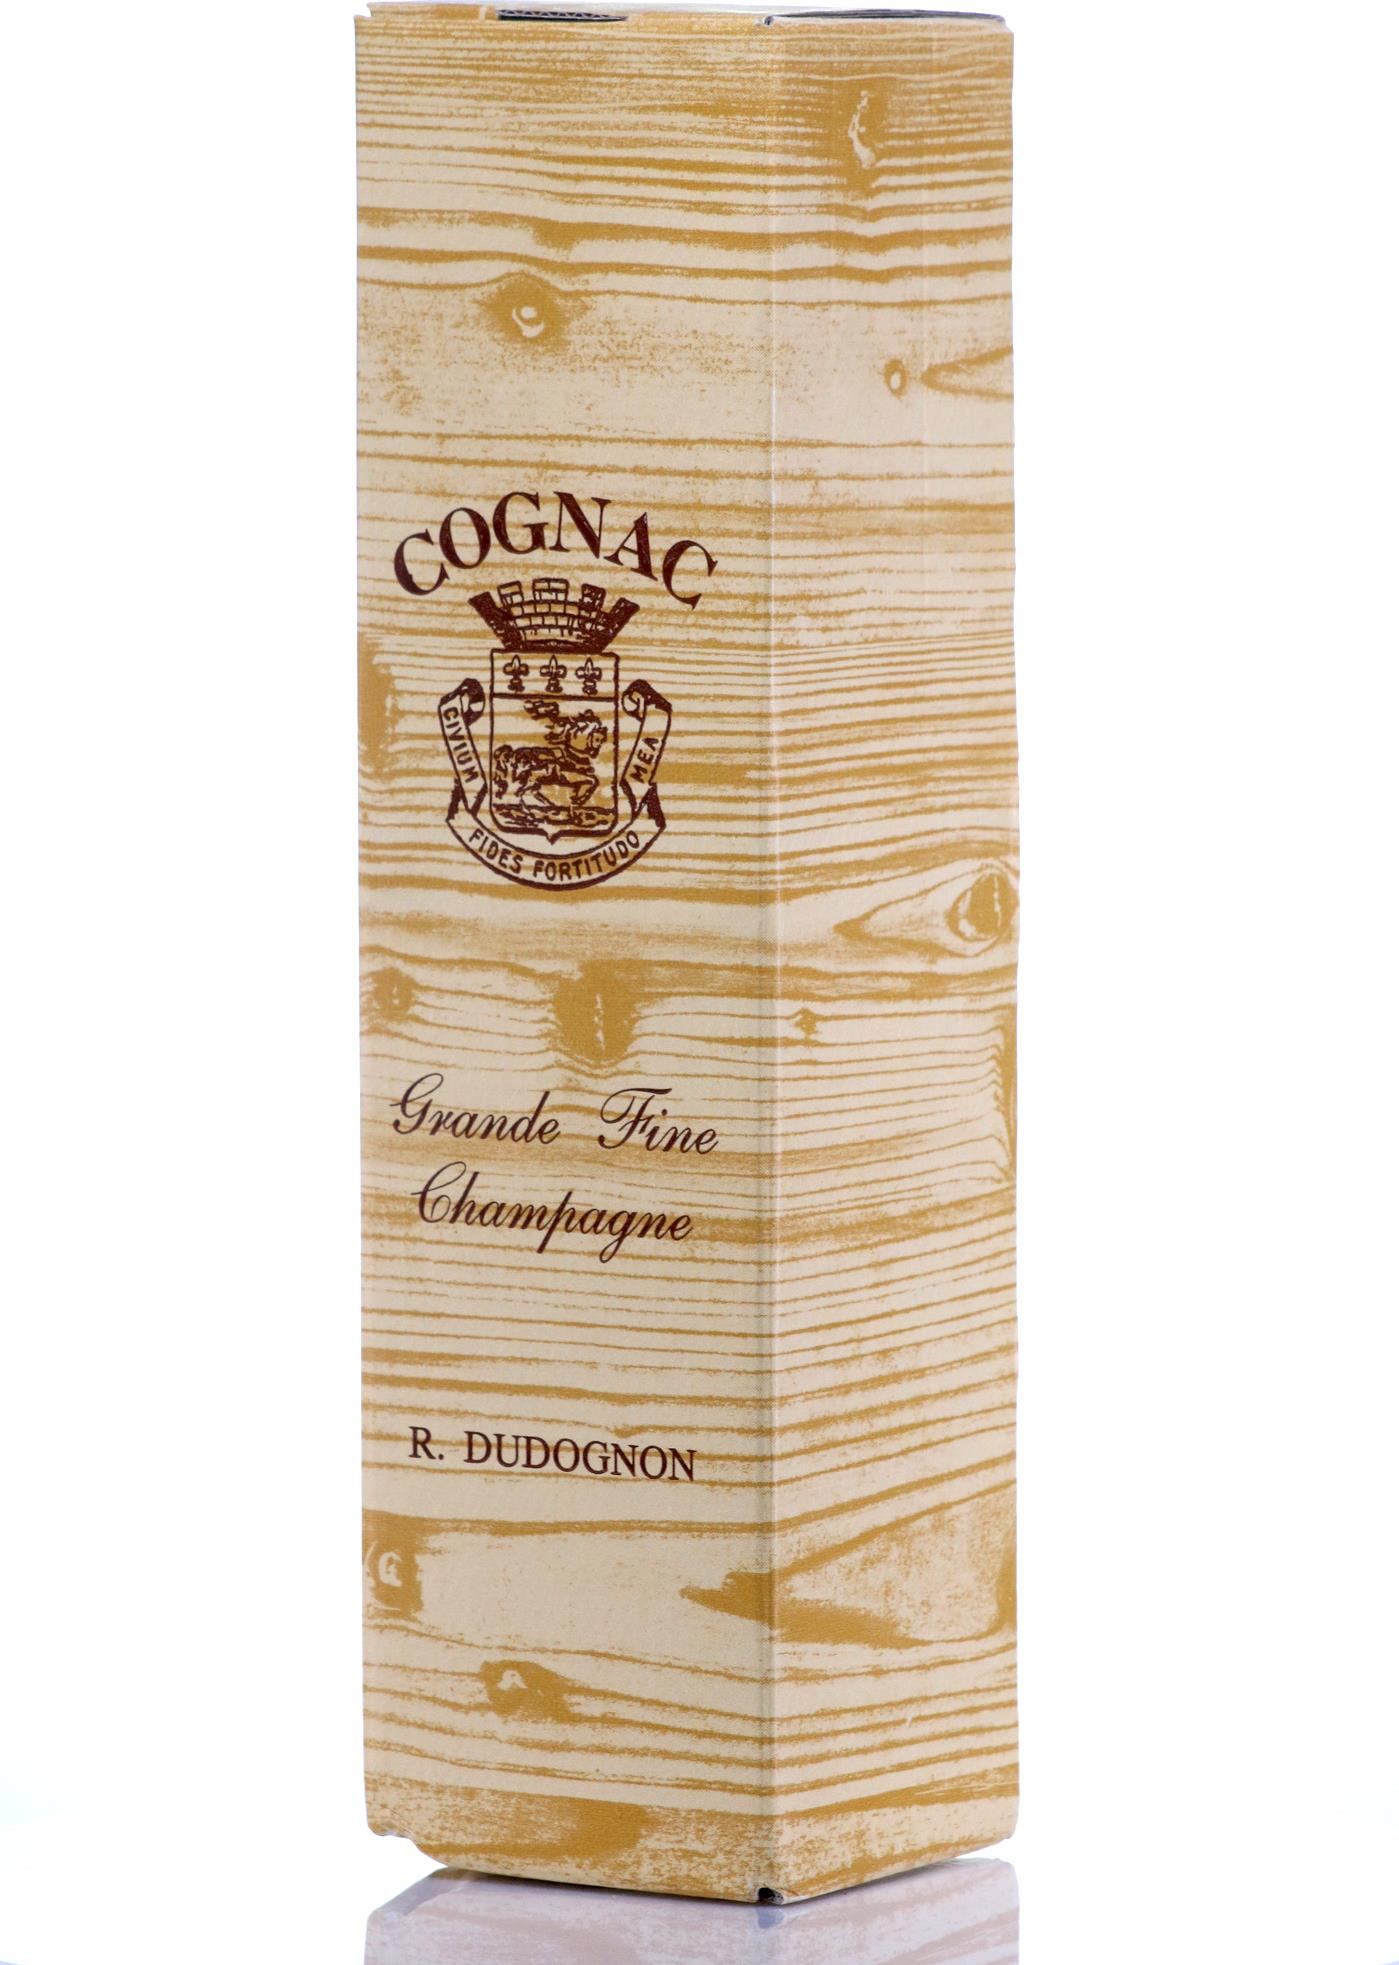 Cognac 1960 Dudognon